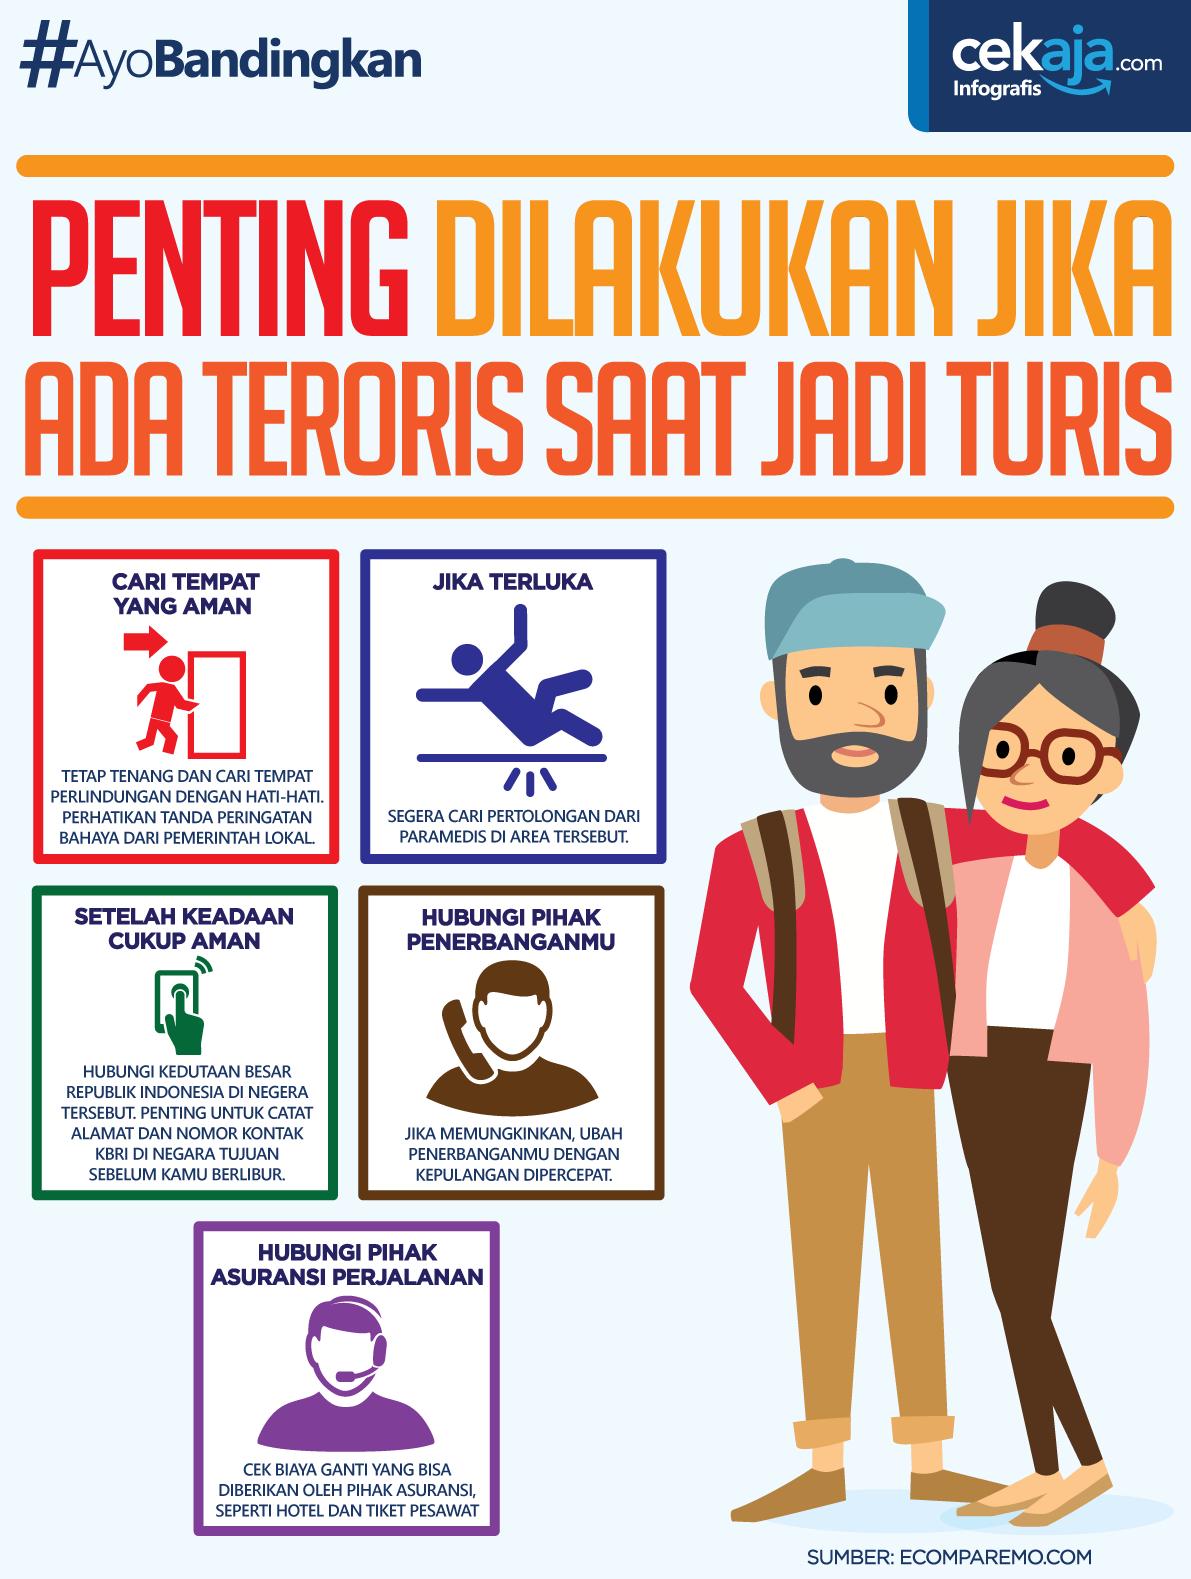 antisipasi serangan teroris - CekAja